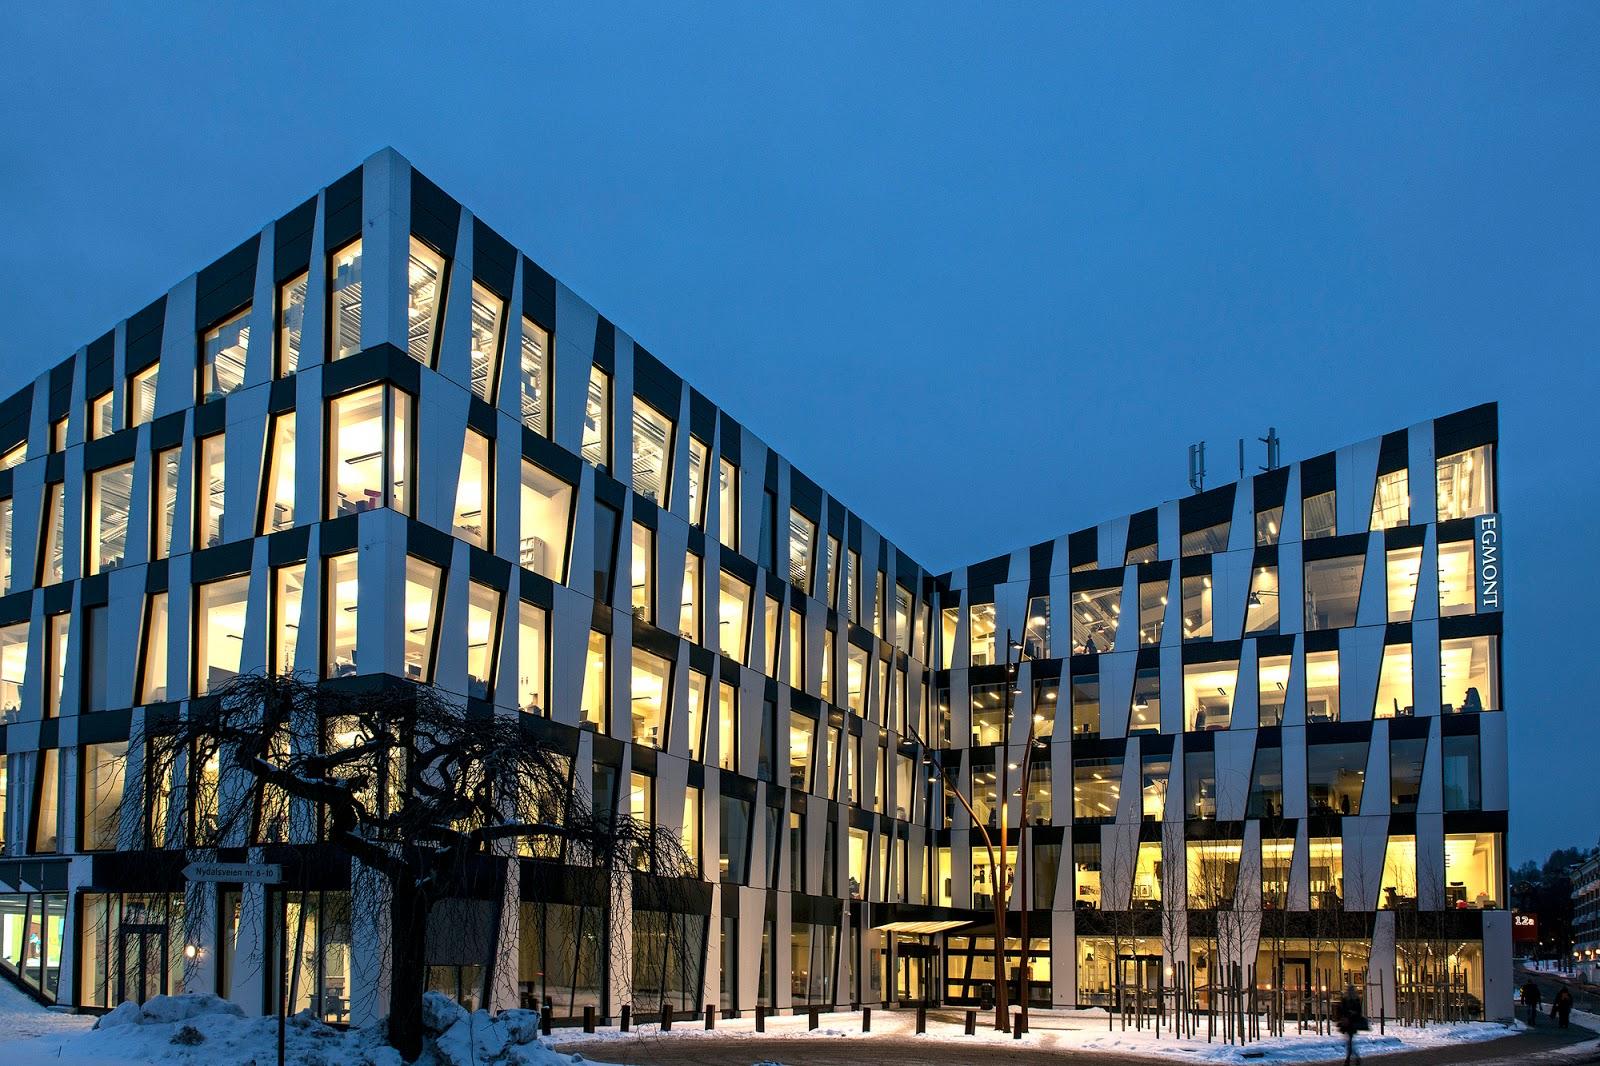 Architecture Art Code Facade Spikerverket By Mad Arkitekter